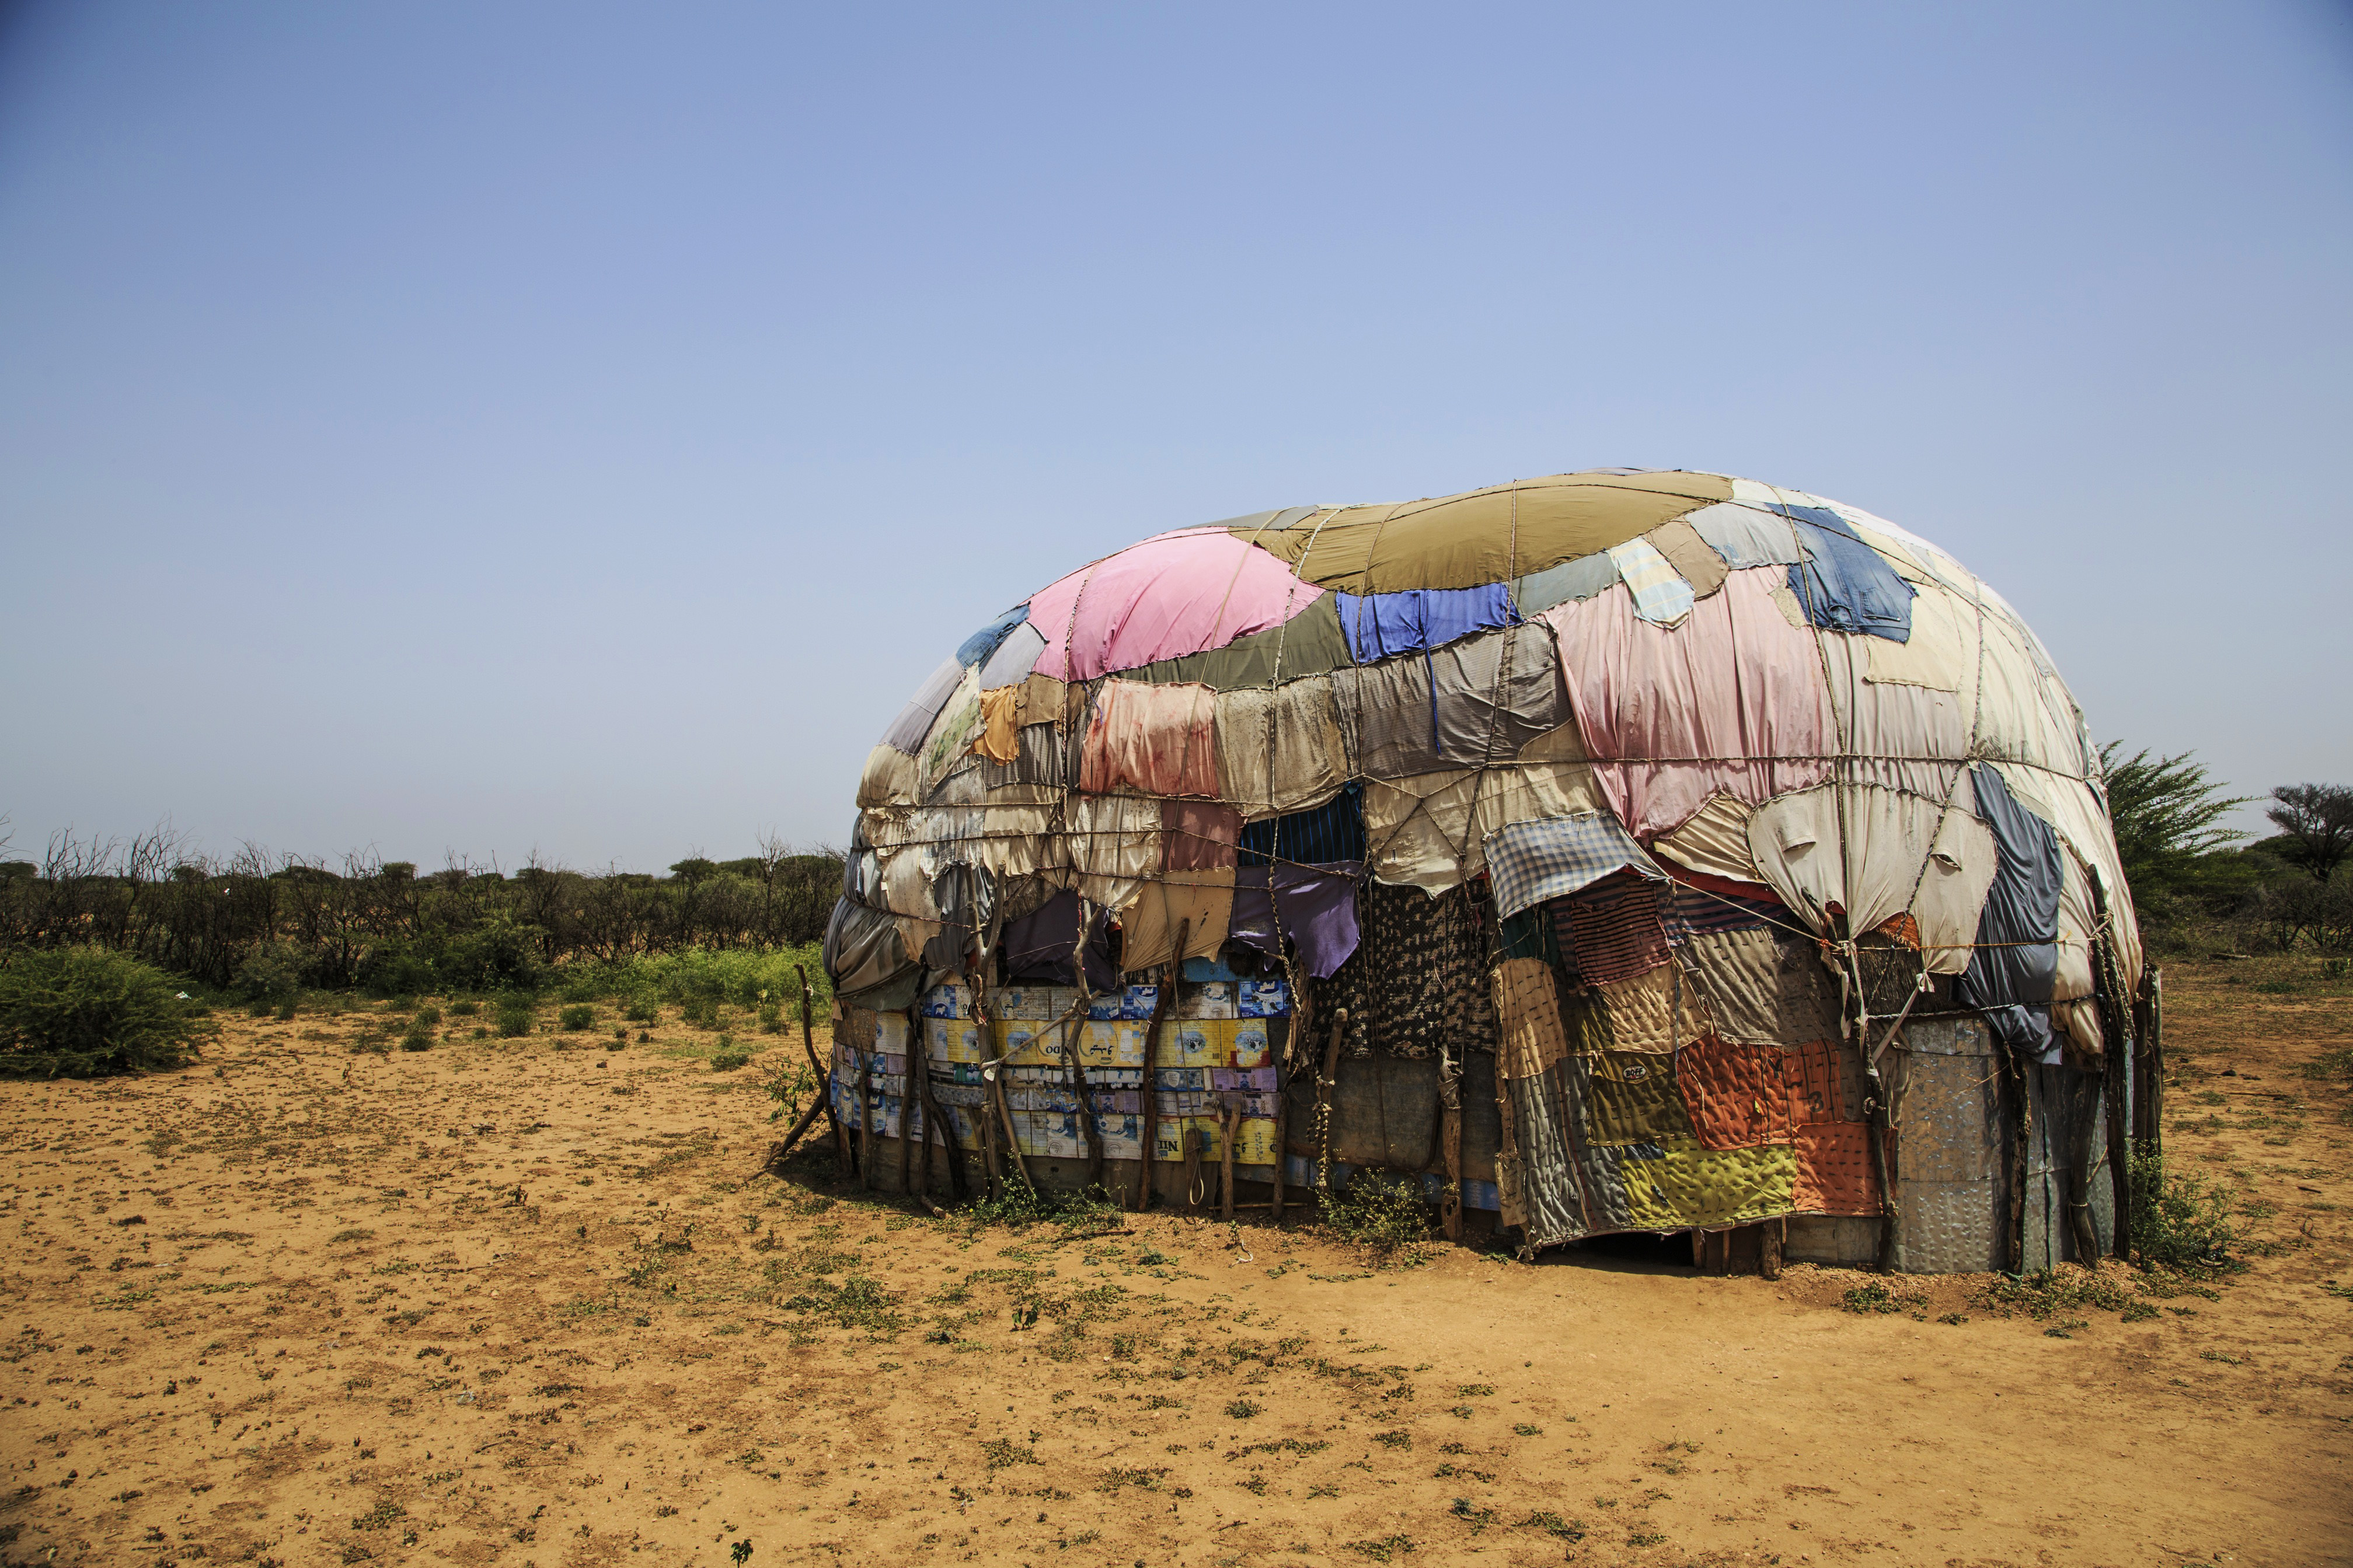 SOMALI HOME